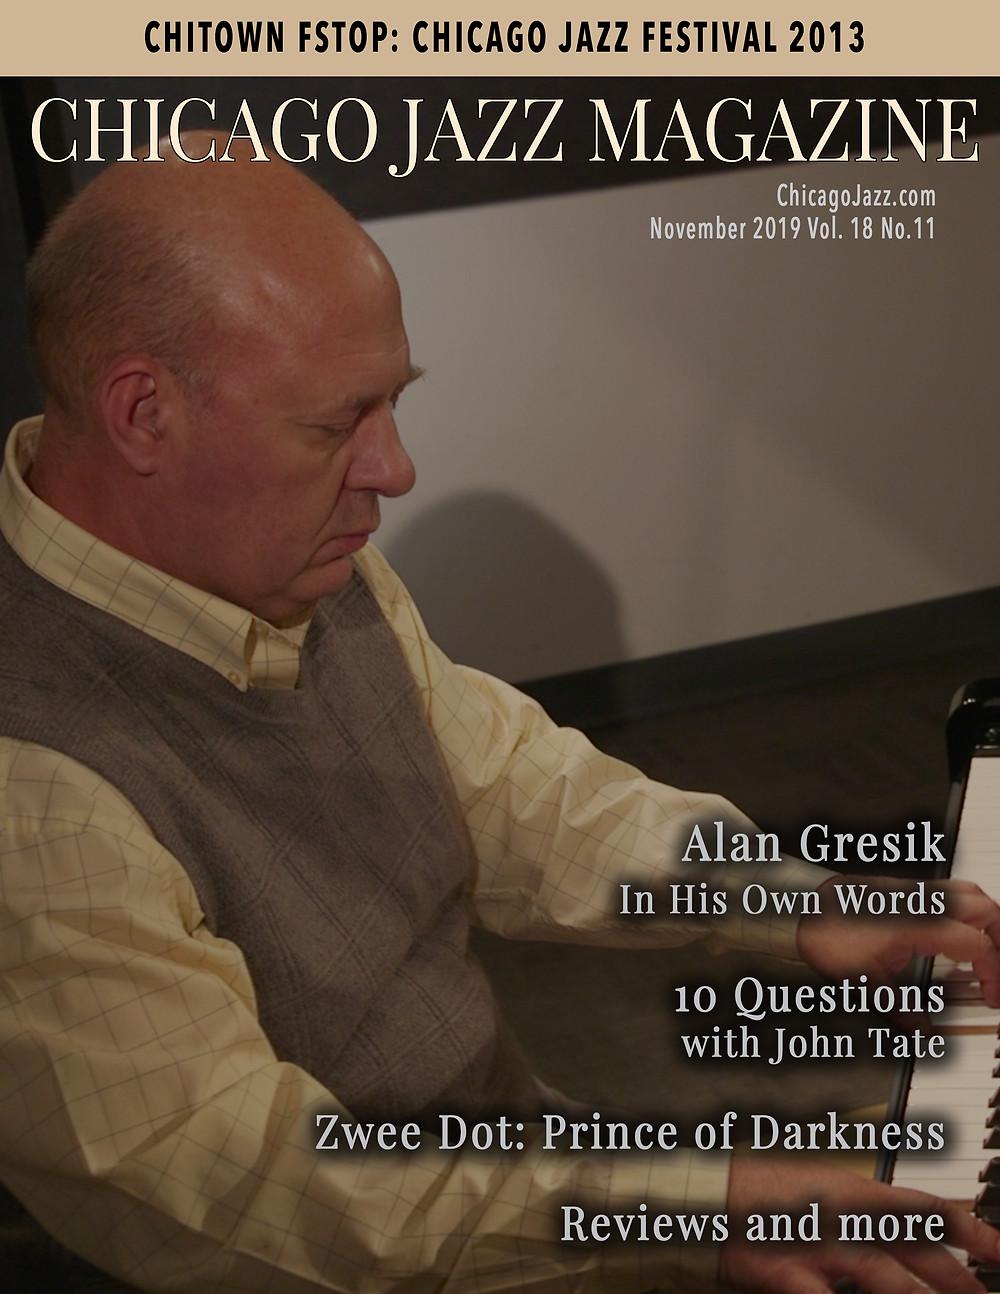 Chicago Jazz Magazine Cover with Alan Gresik